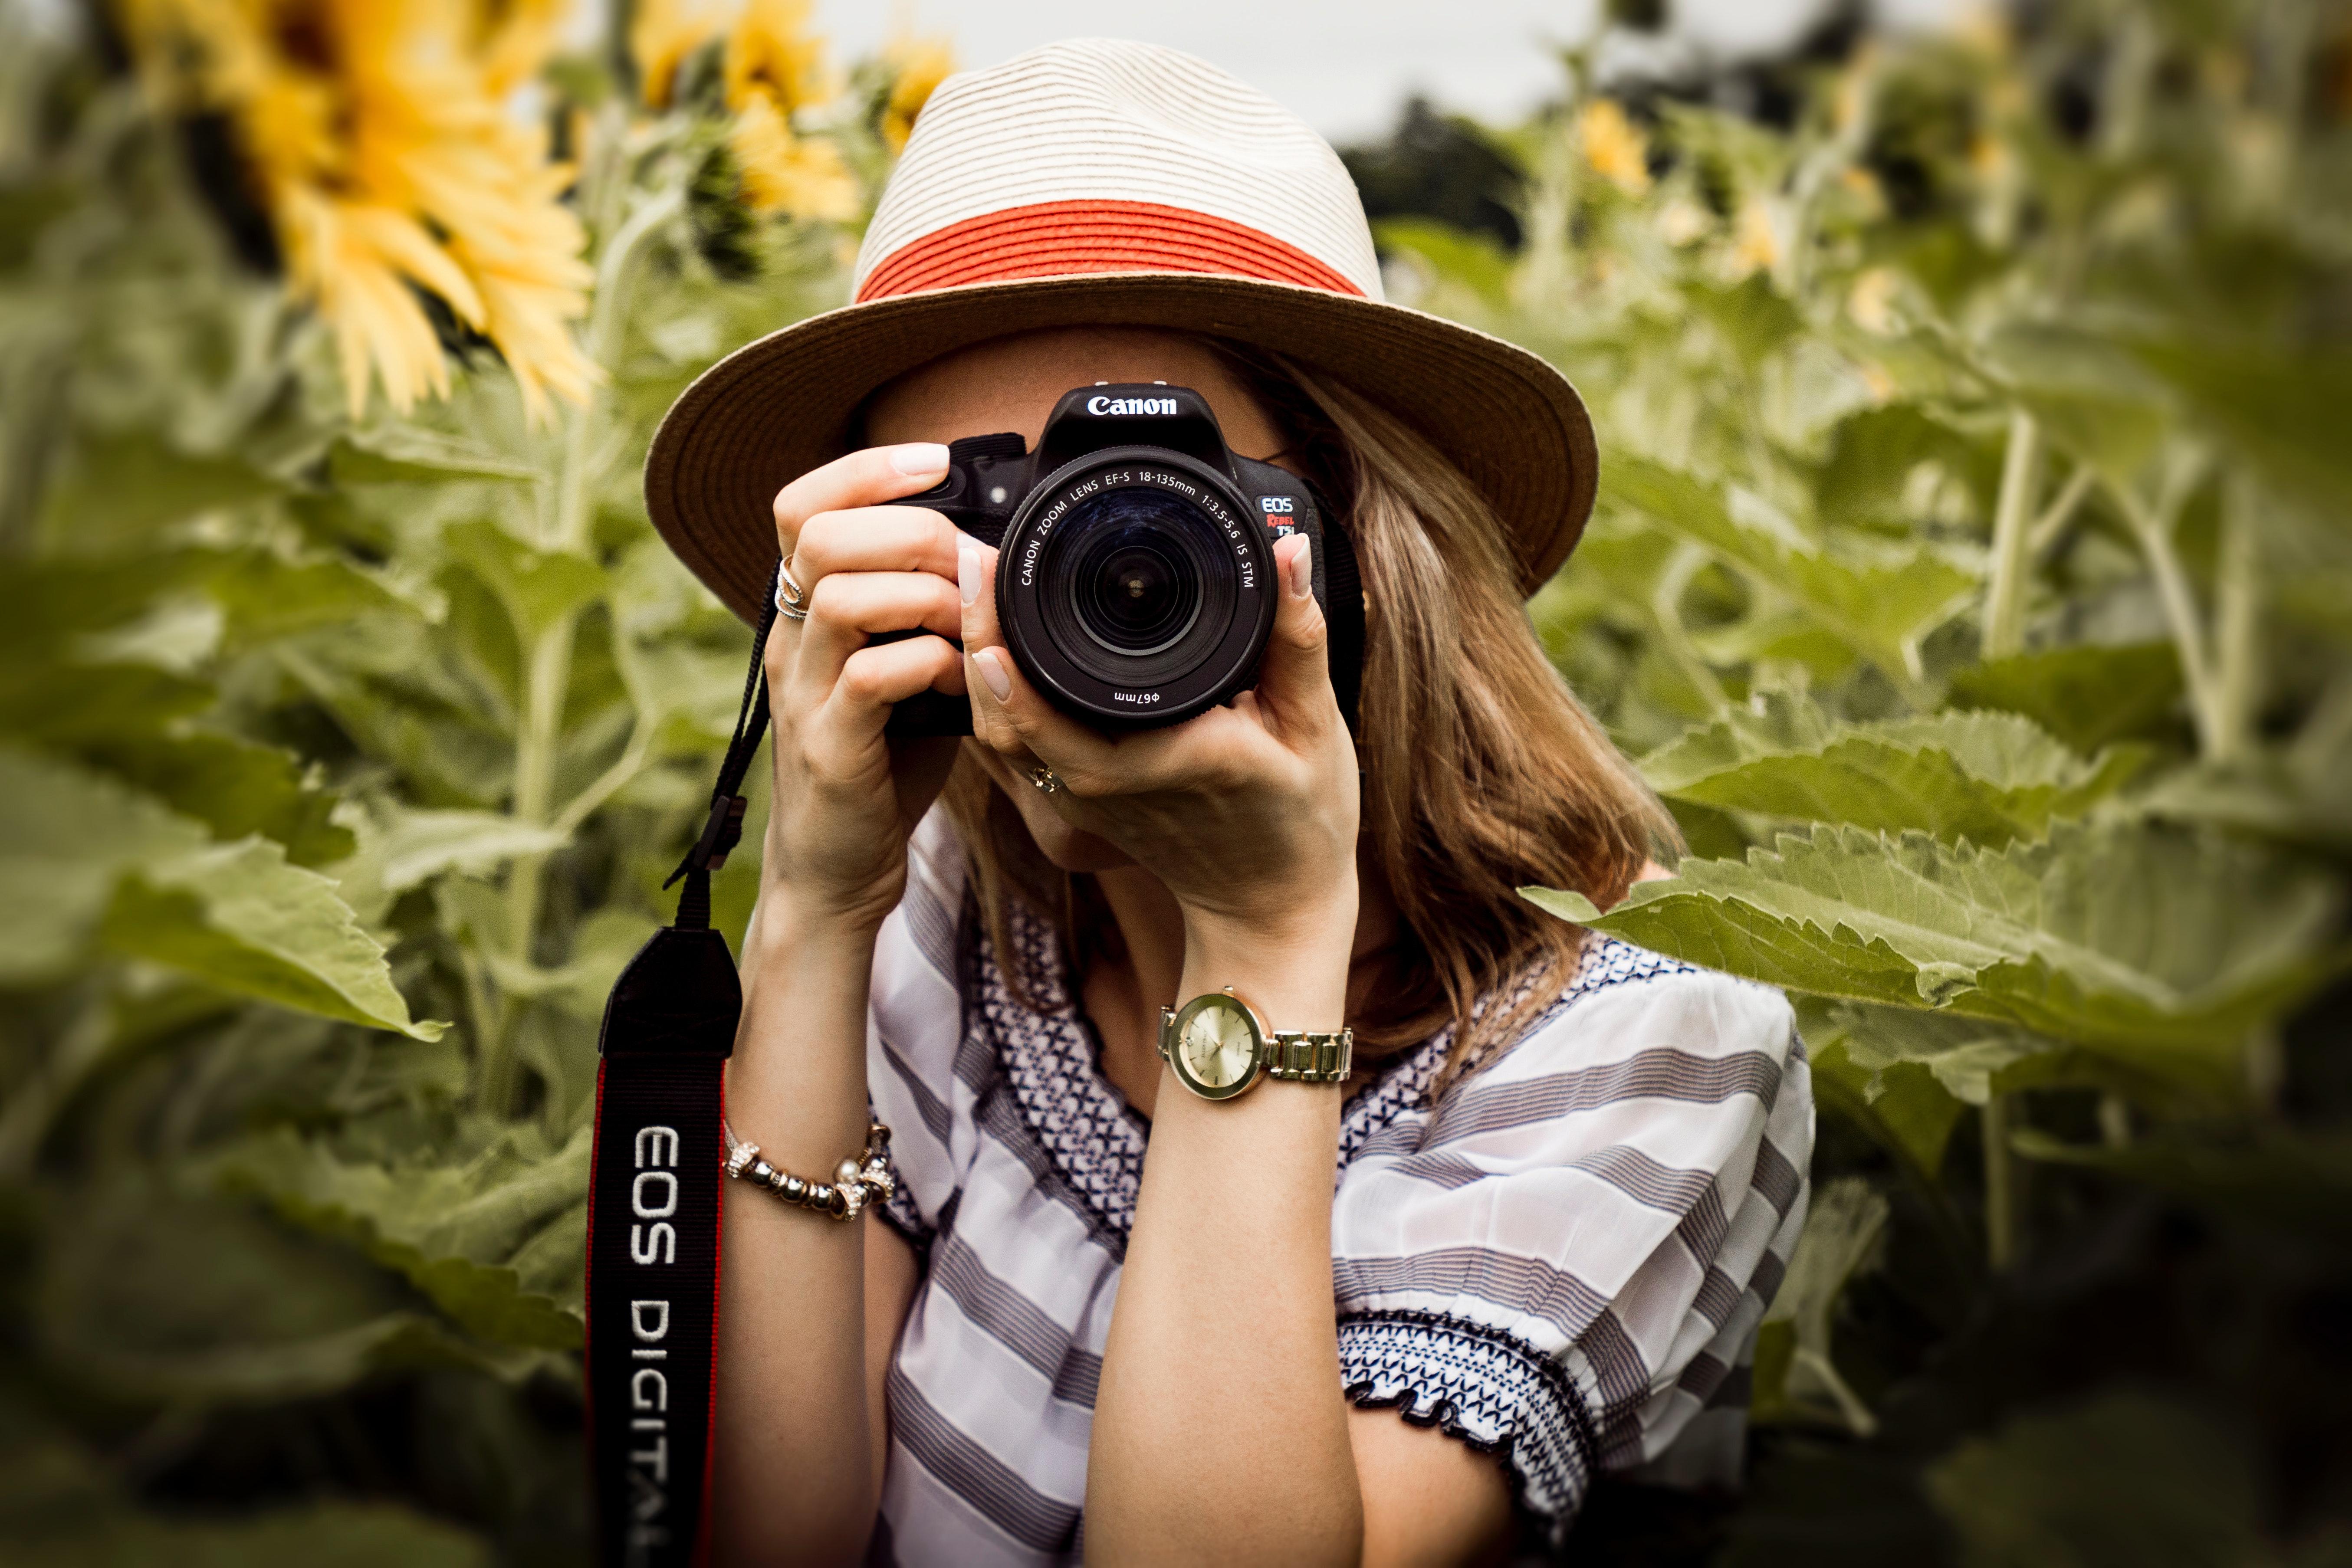 fotografa - nuevas entrevistas